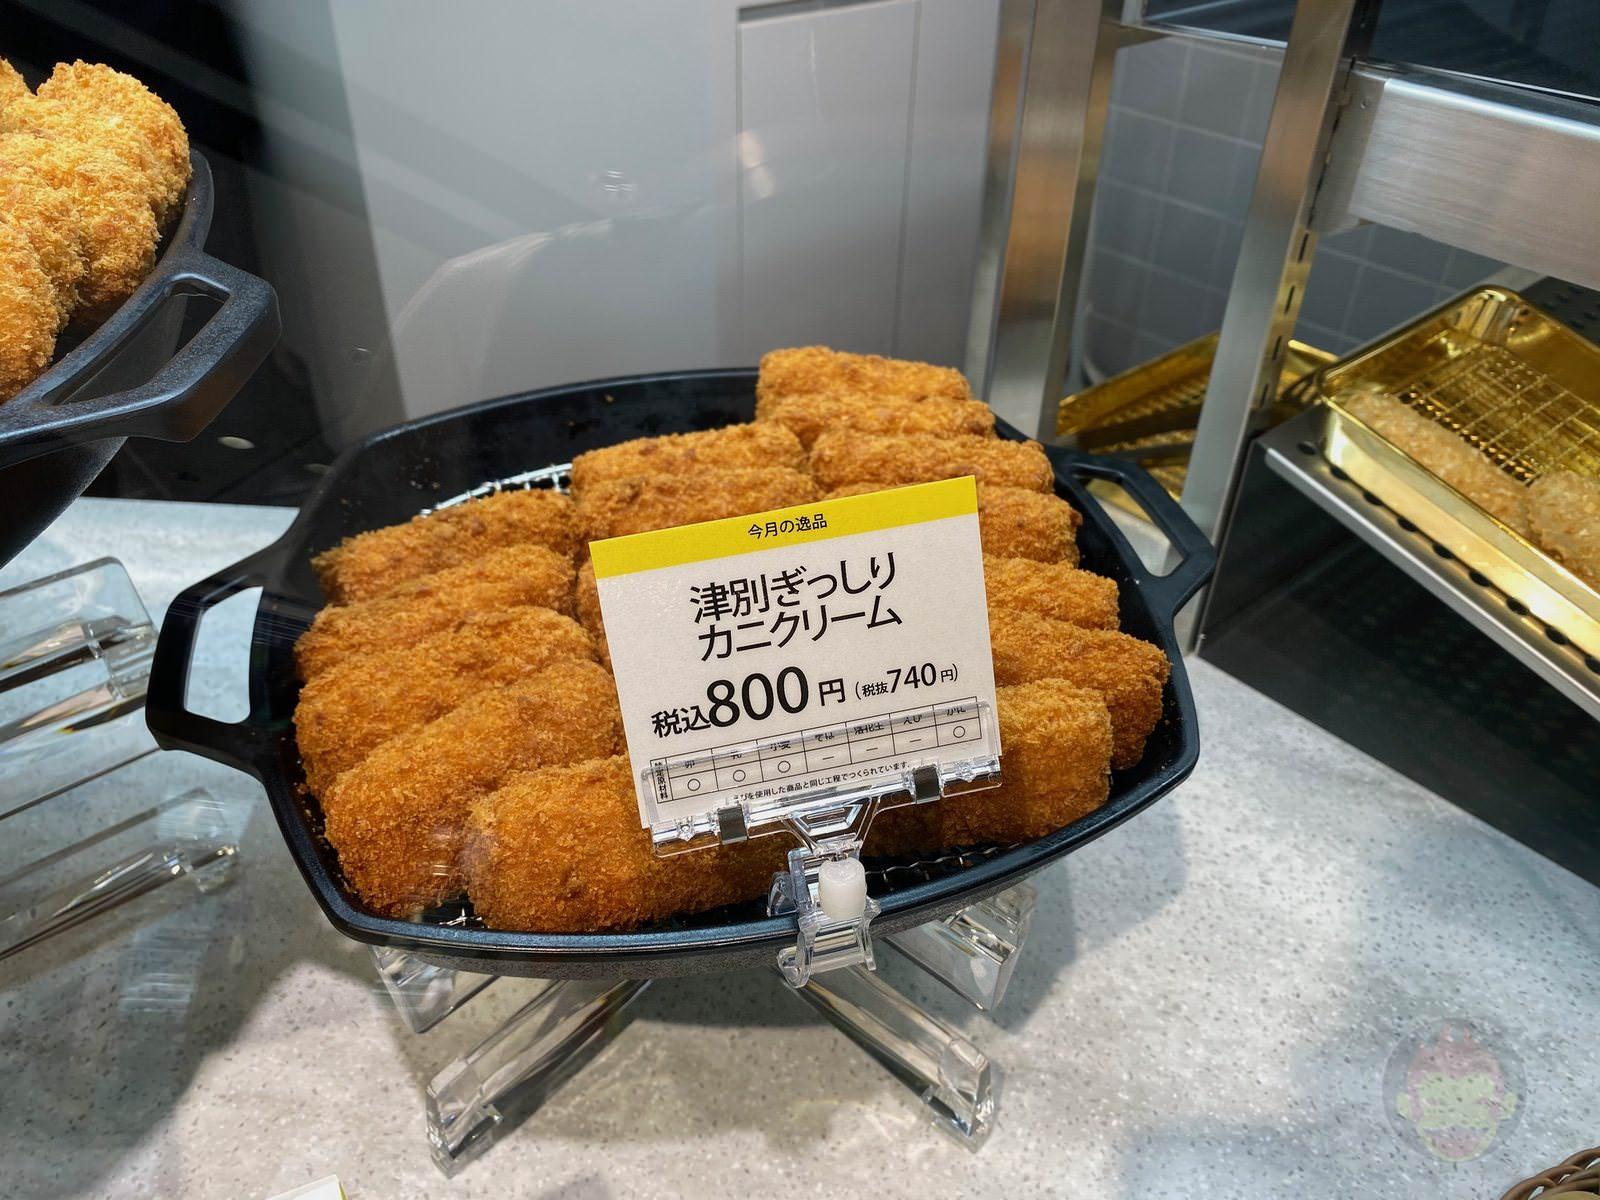 Shibuya-Scramble-Square-Food-I-Ate-162.jpeg